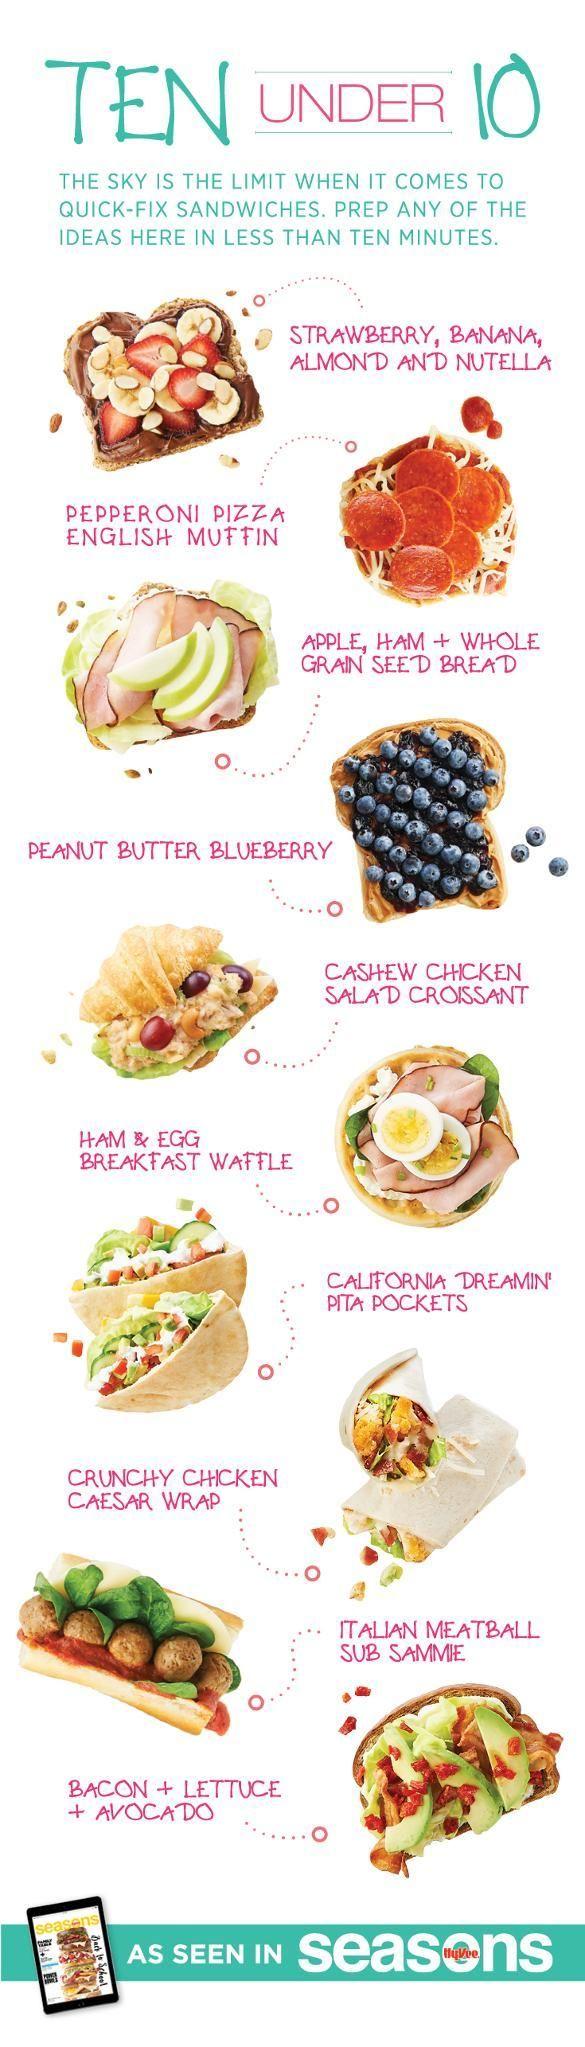 10 quick-fix sandwich ideas